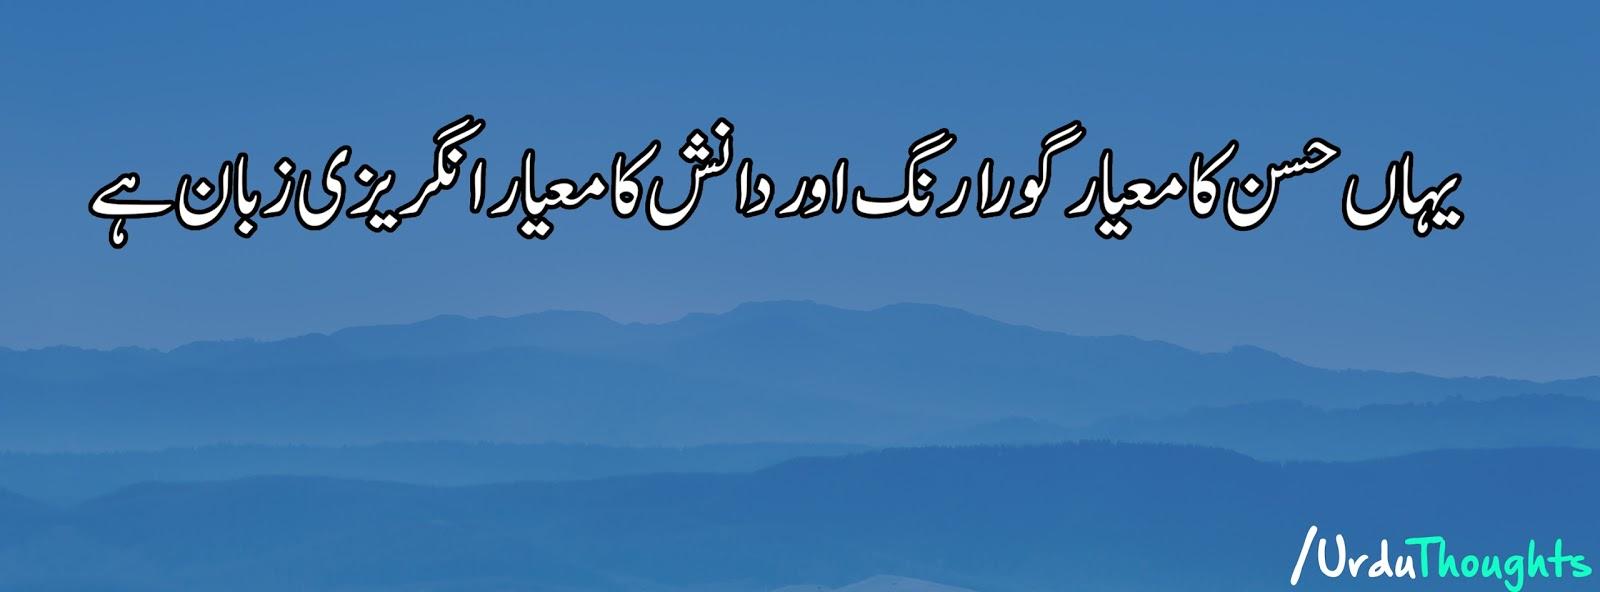 Life Cover Quotes Beautiful Urdu Quotes Cover Photos  Urdu Facebook Cover  Poetry